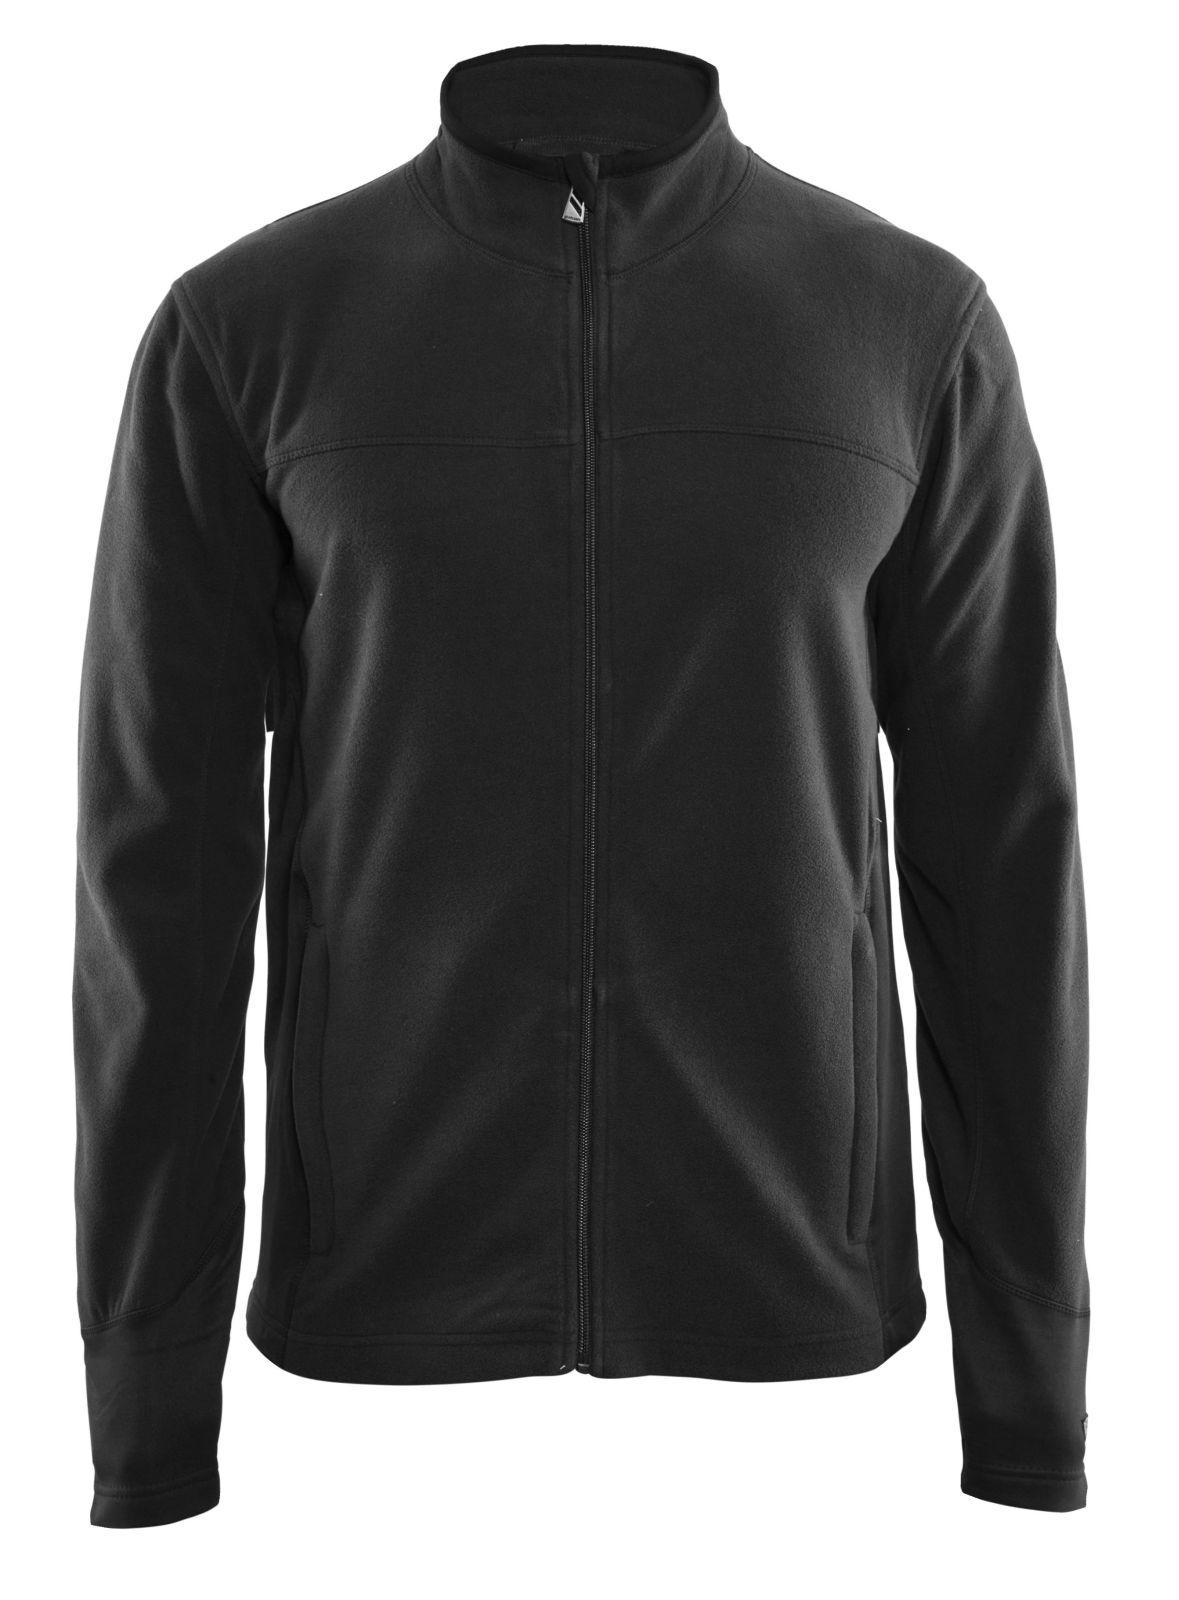 Blaklader Fleece vesten 48951010 zwart(9900)